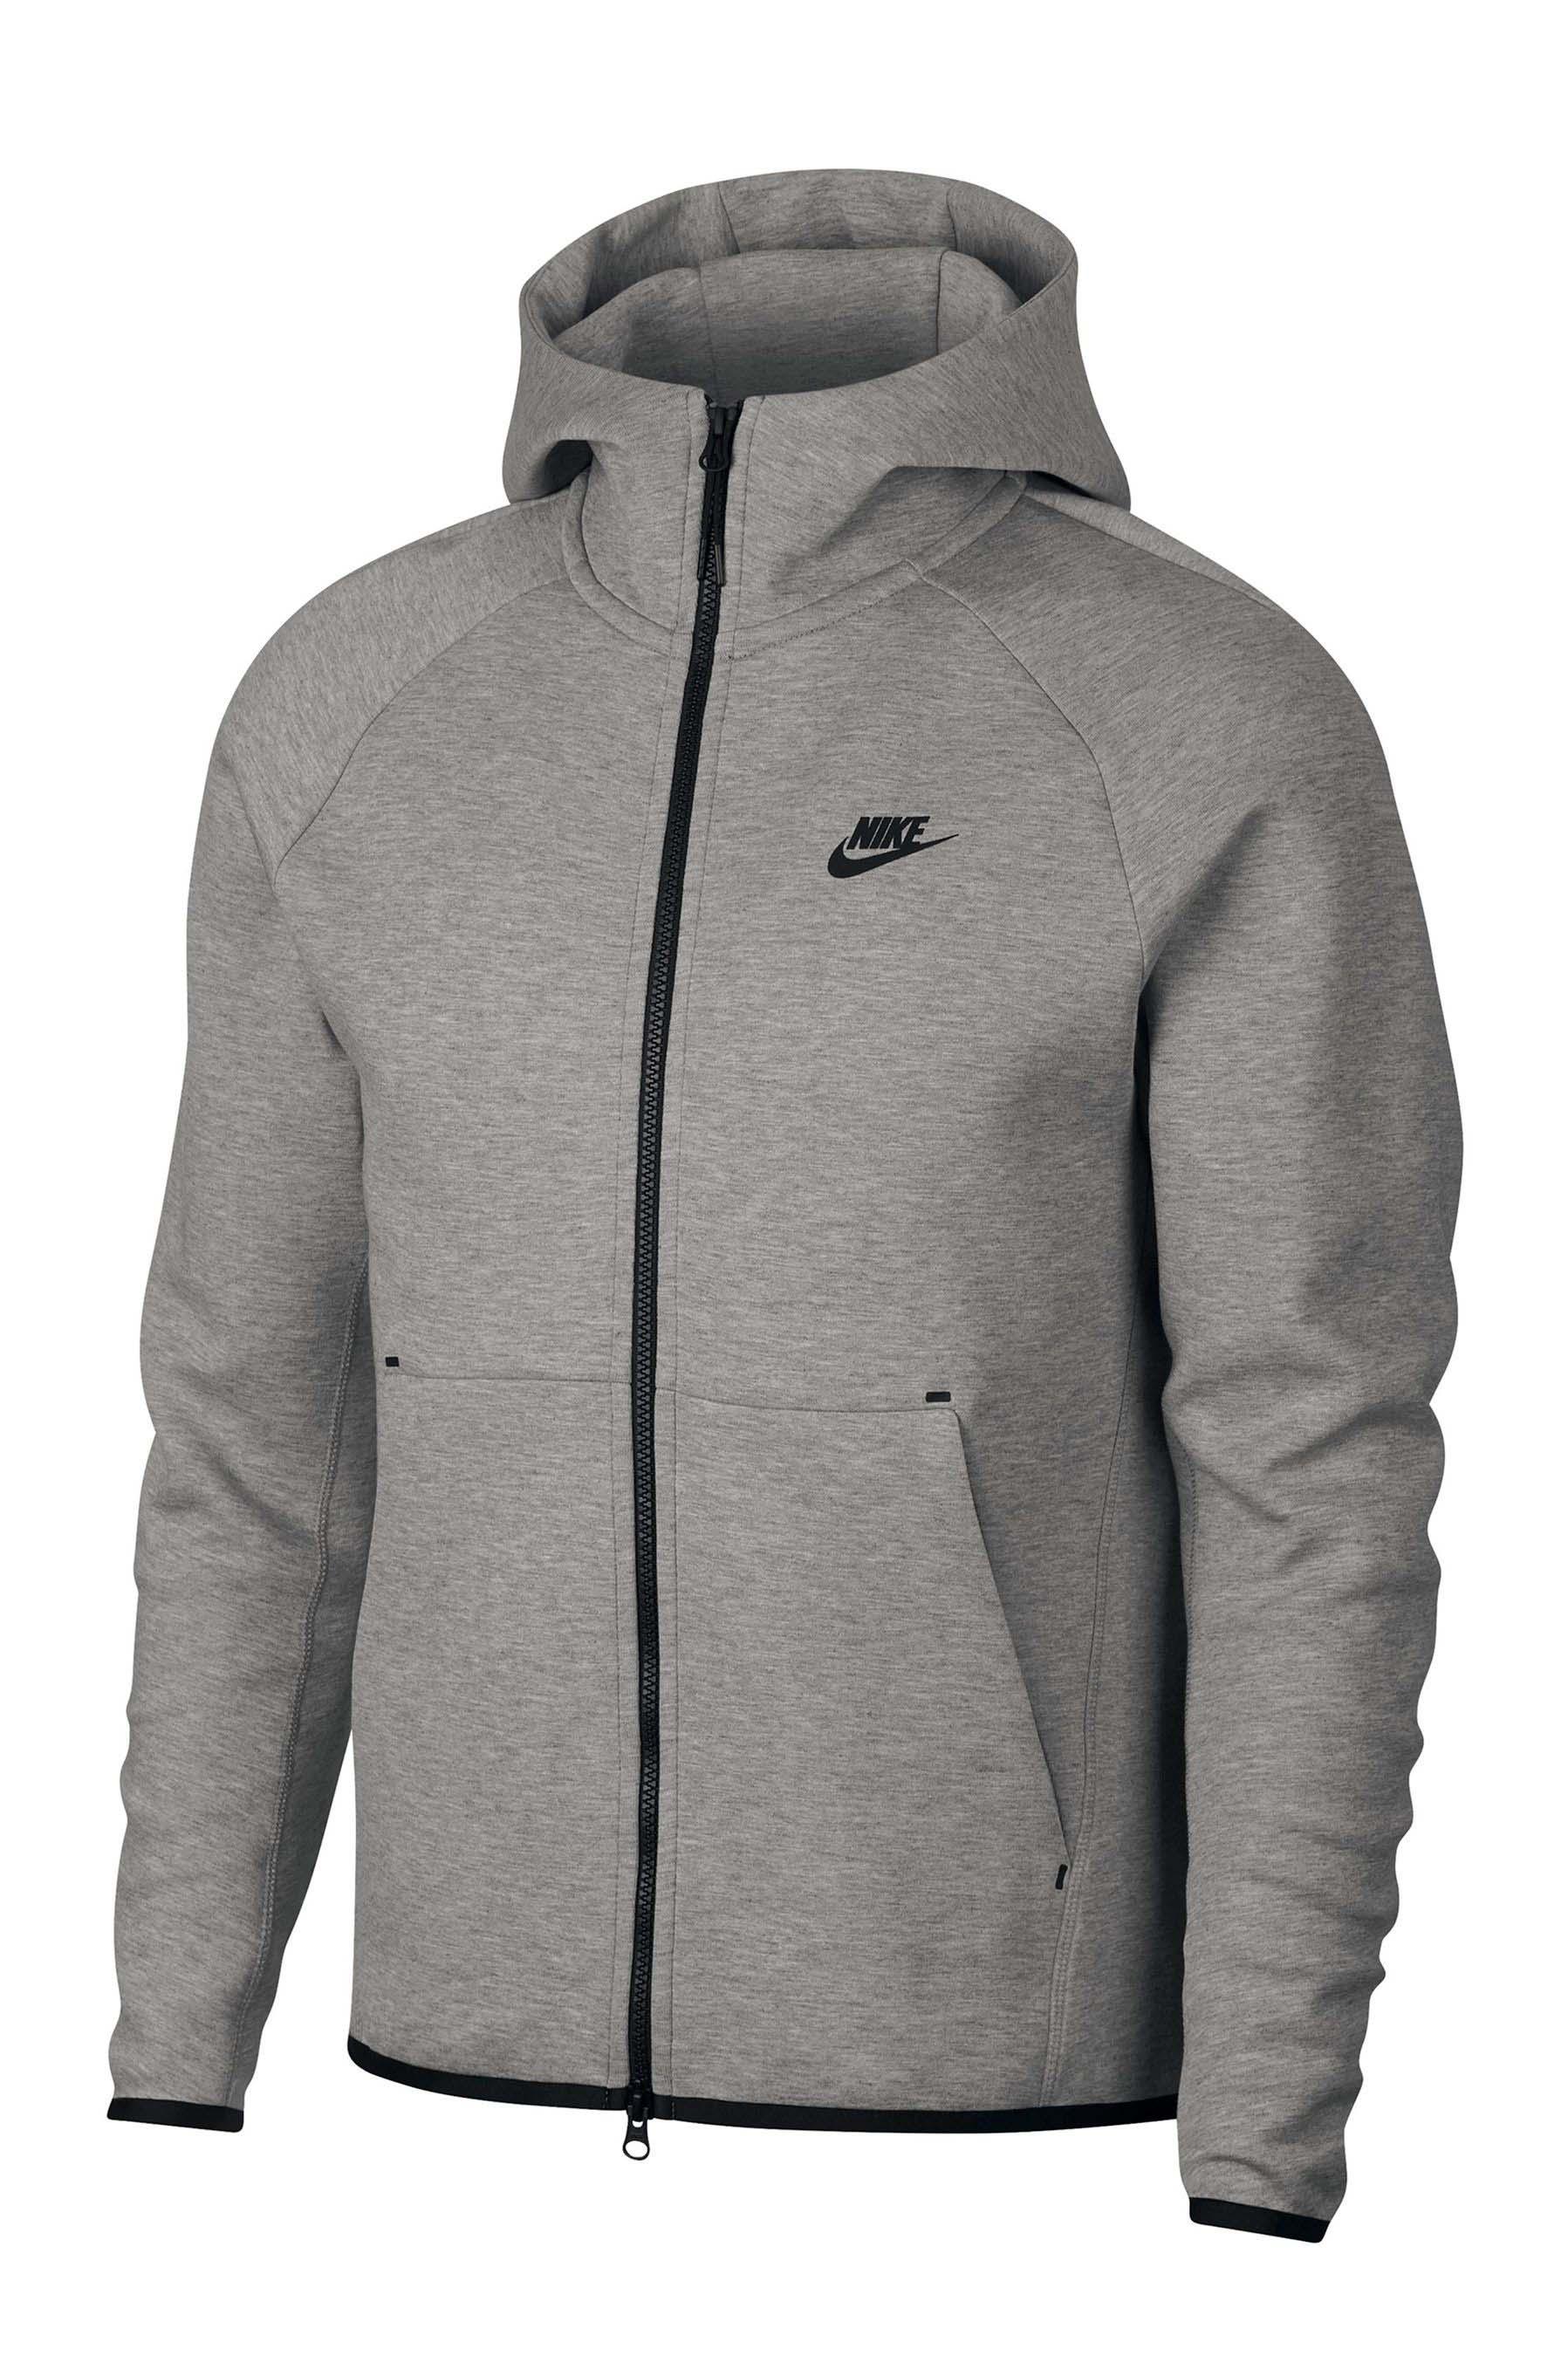 Mens Nike Tech Fleece Hoody Grey Nike tech fleece